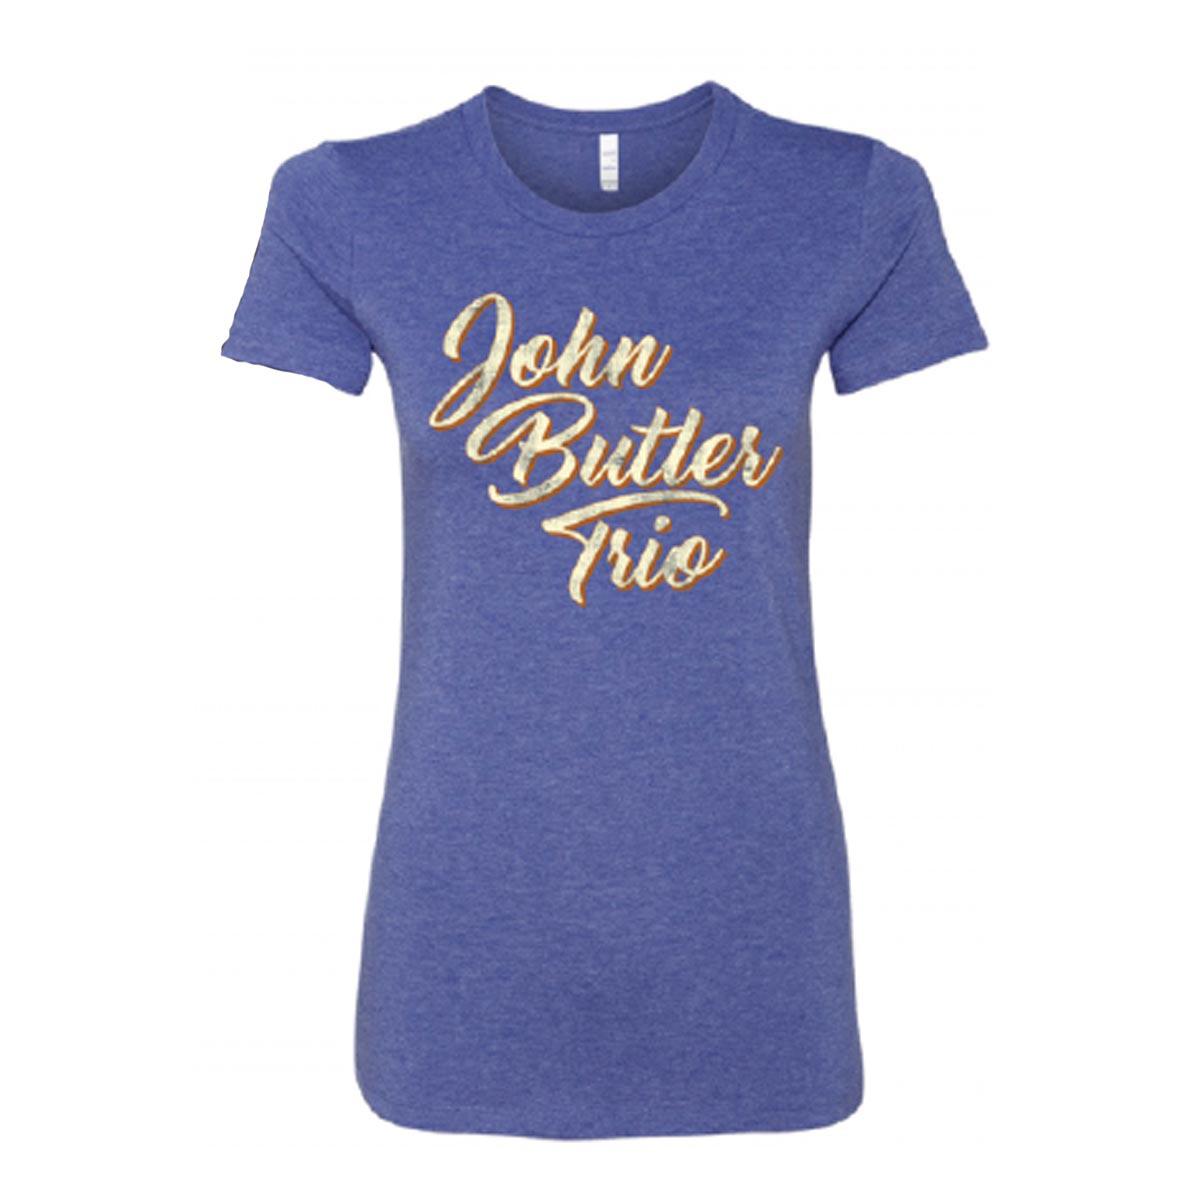 Women's John Butler Trio T-shirt